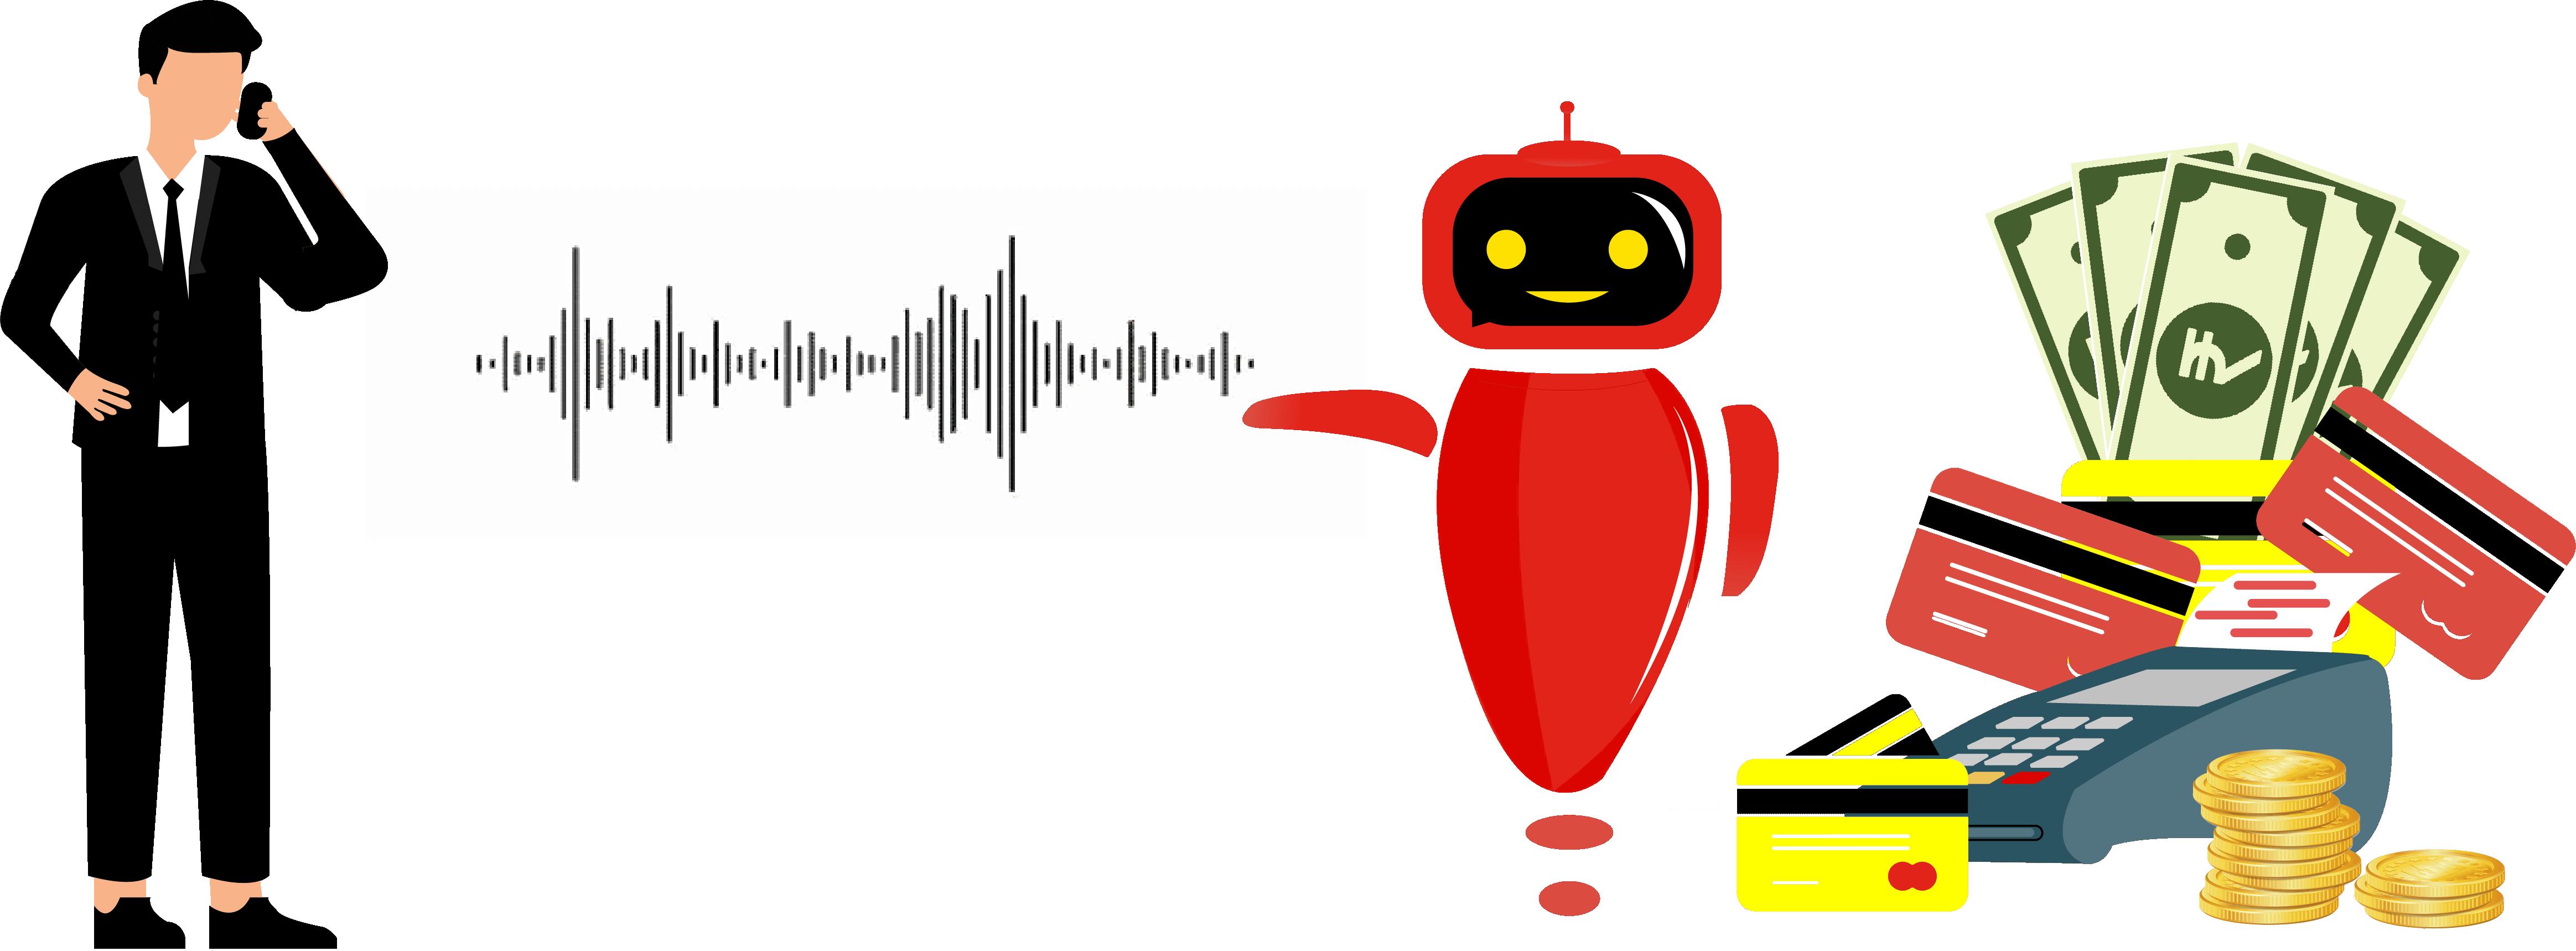 Kwantics AI speech solutions providing customer satisfaction